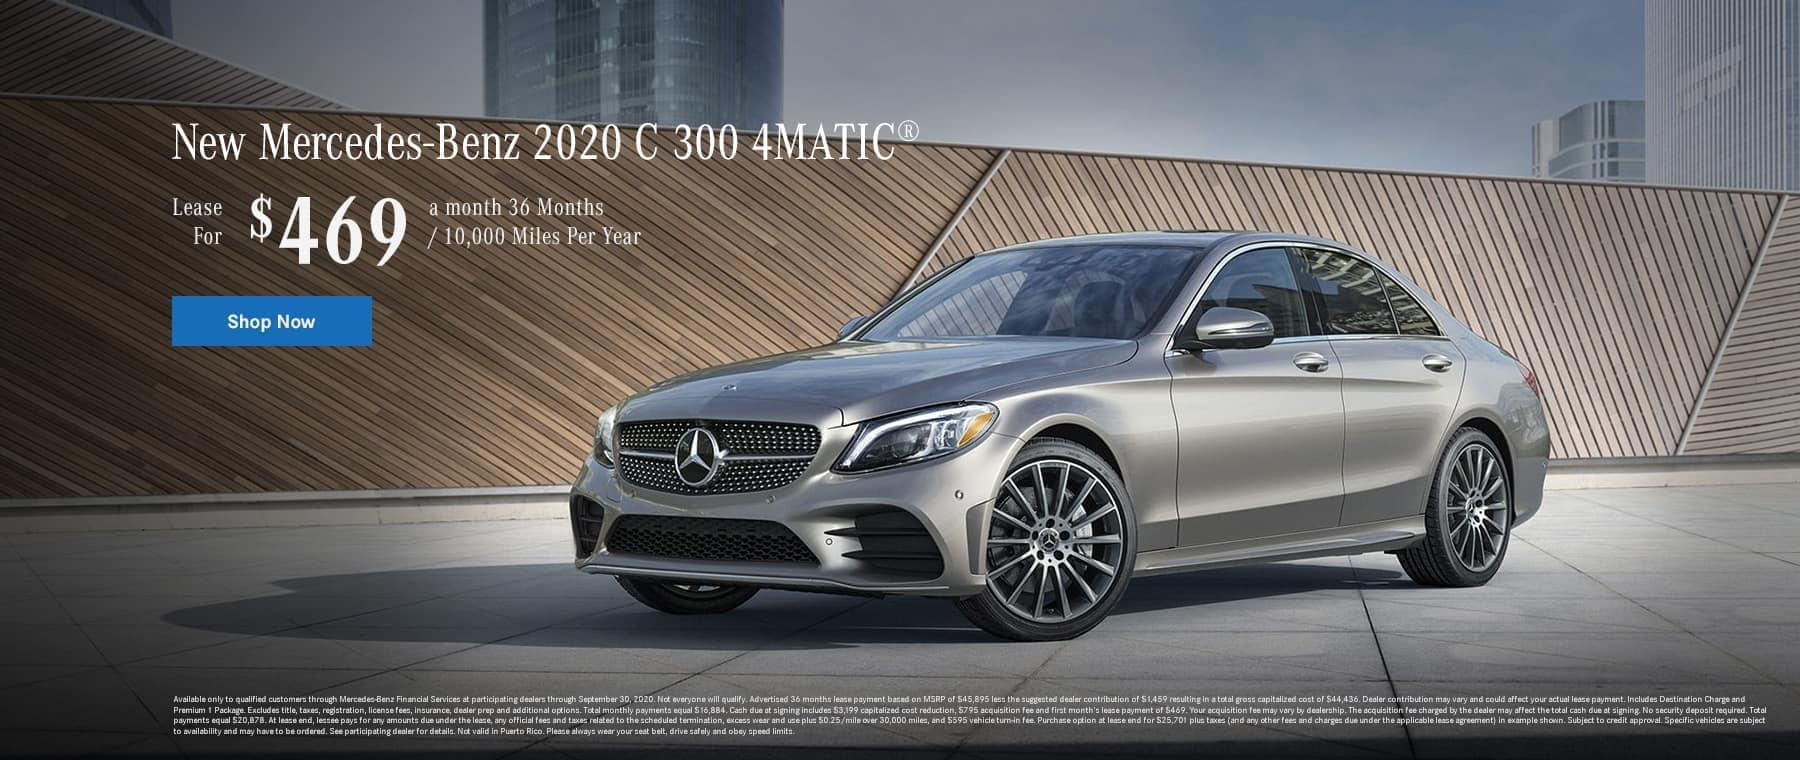 2020 C300